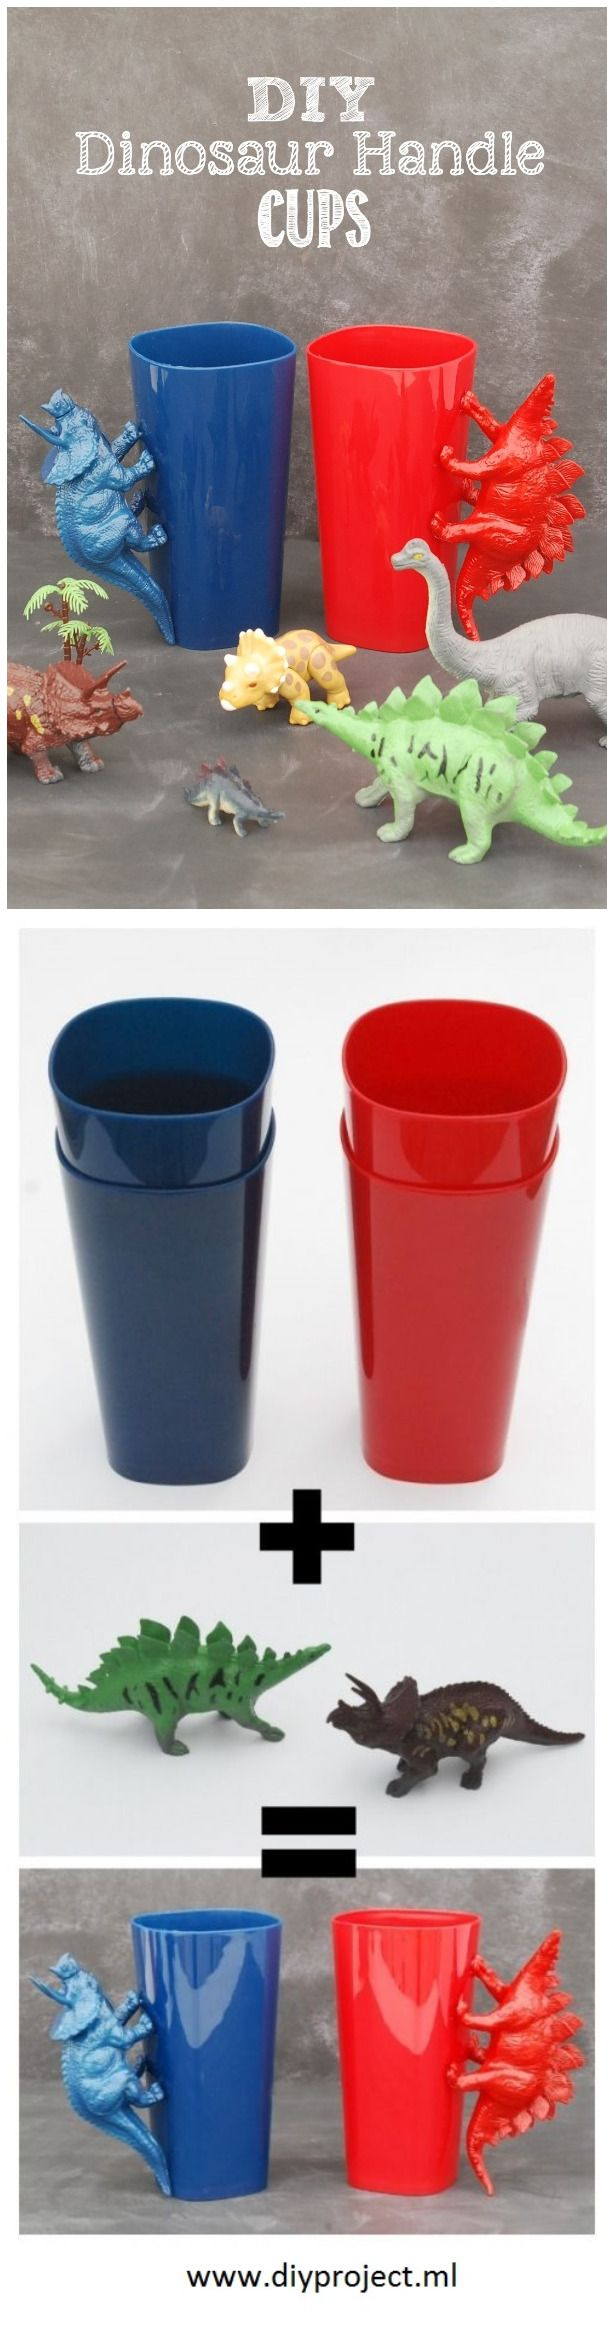 Make Cute DIY Dinosaur Handle Cups